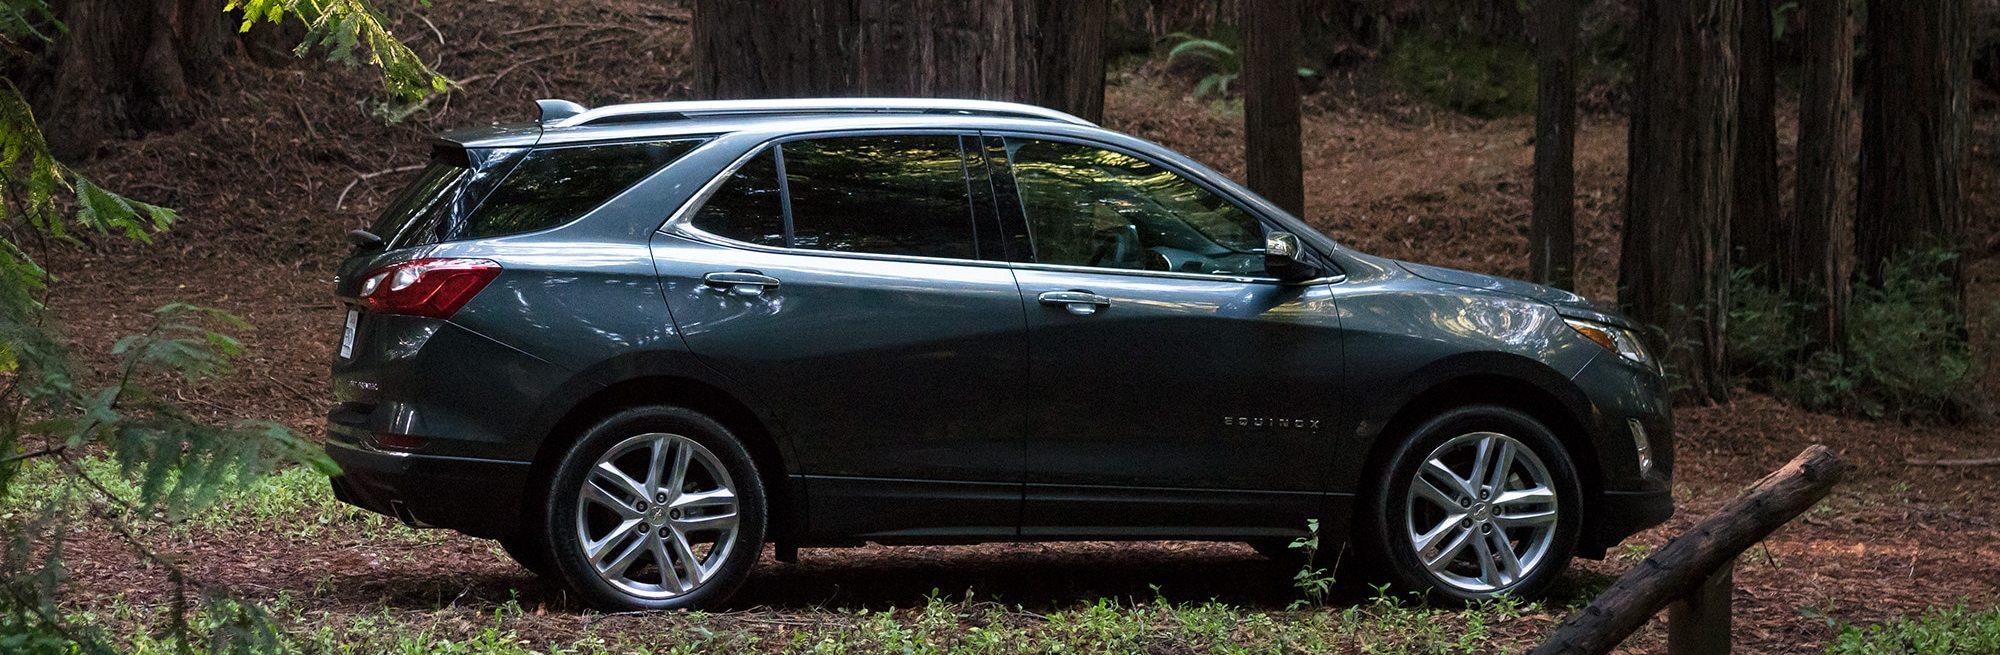 2020 Chevrolet Equinox for Sale near Washington, DC